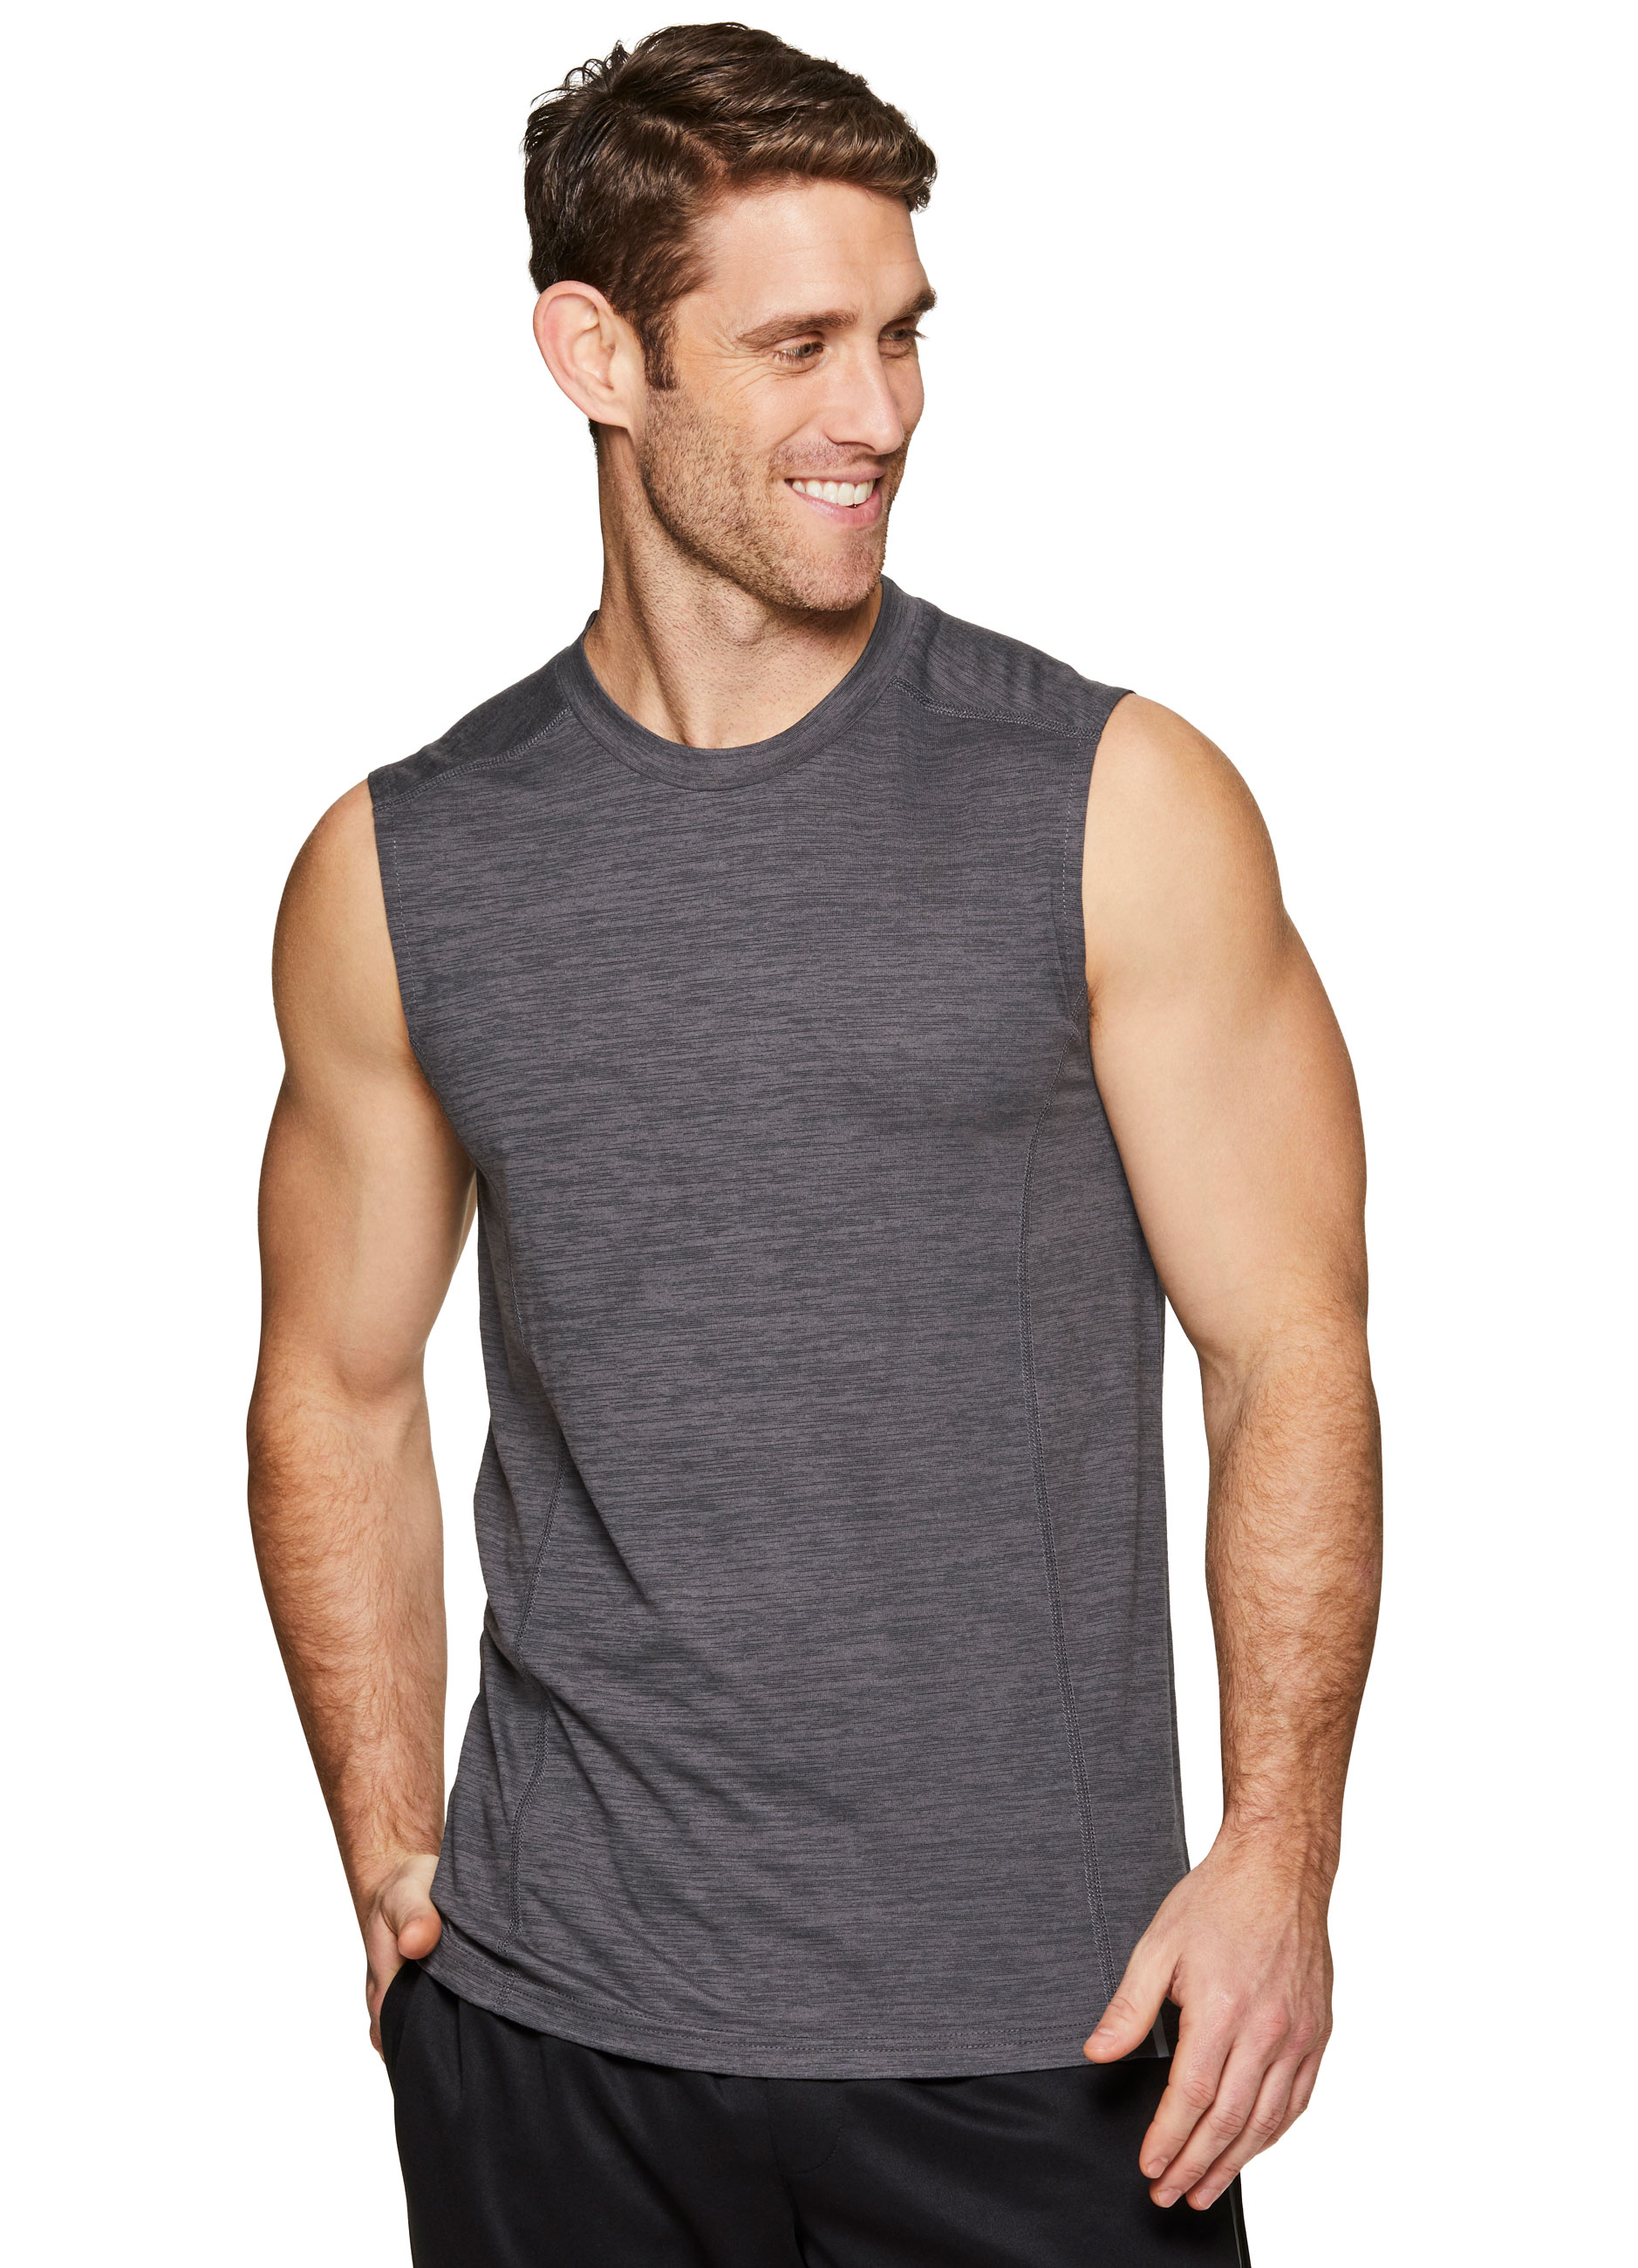 Mens Outdoor Sport Paint Parrot Flying Bird Tank Top Vest T-Shirt Fast Drying Stylish Sleeveless Tee